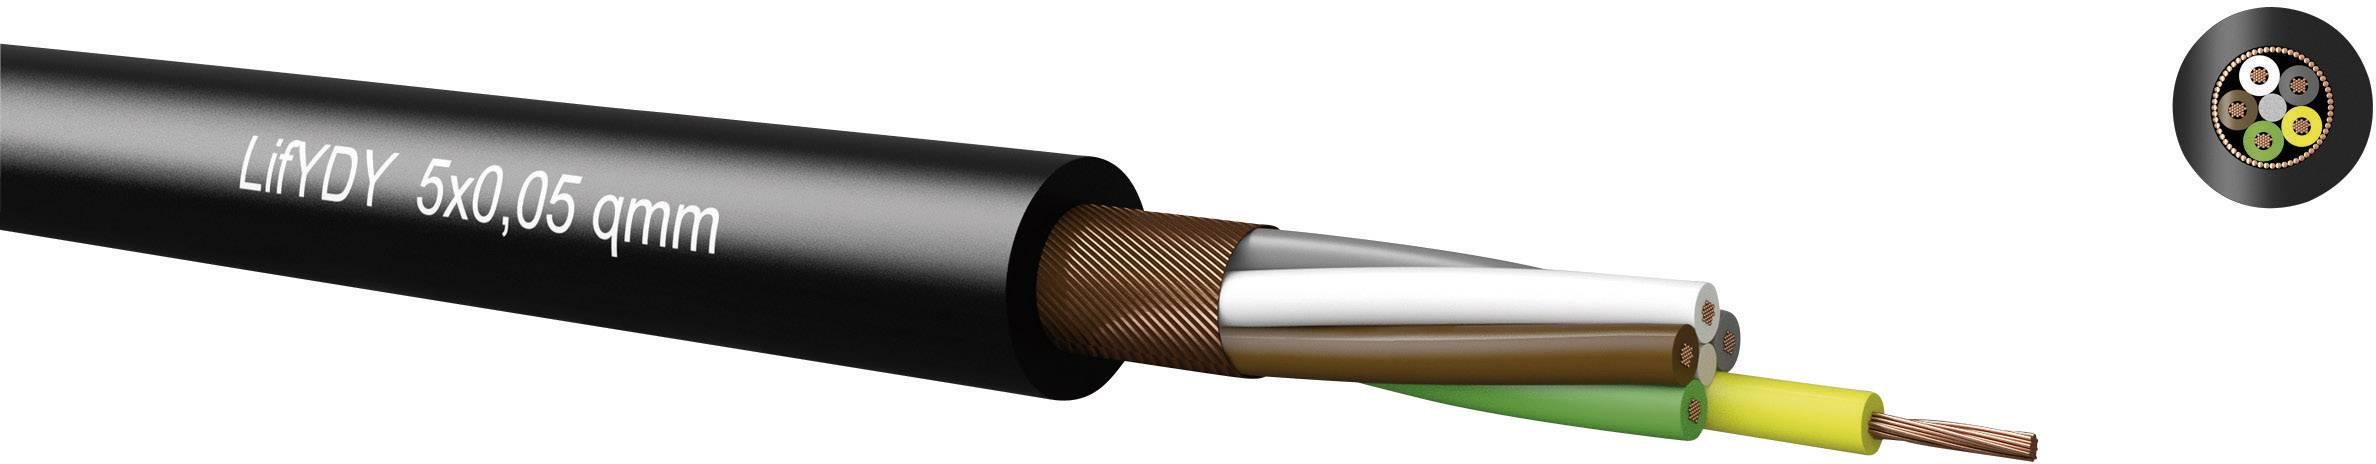 Riadiaci kábel Kabeltronik LifYDY 340500500, 5 x 0.05 mm², vonkajší Ø 3.20 mm, 100 V, metrový tovar, čierna